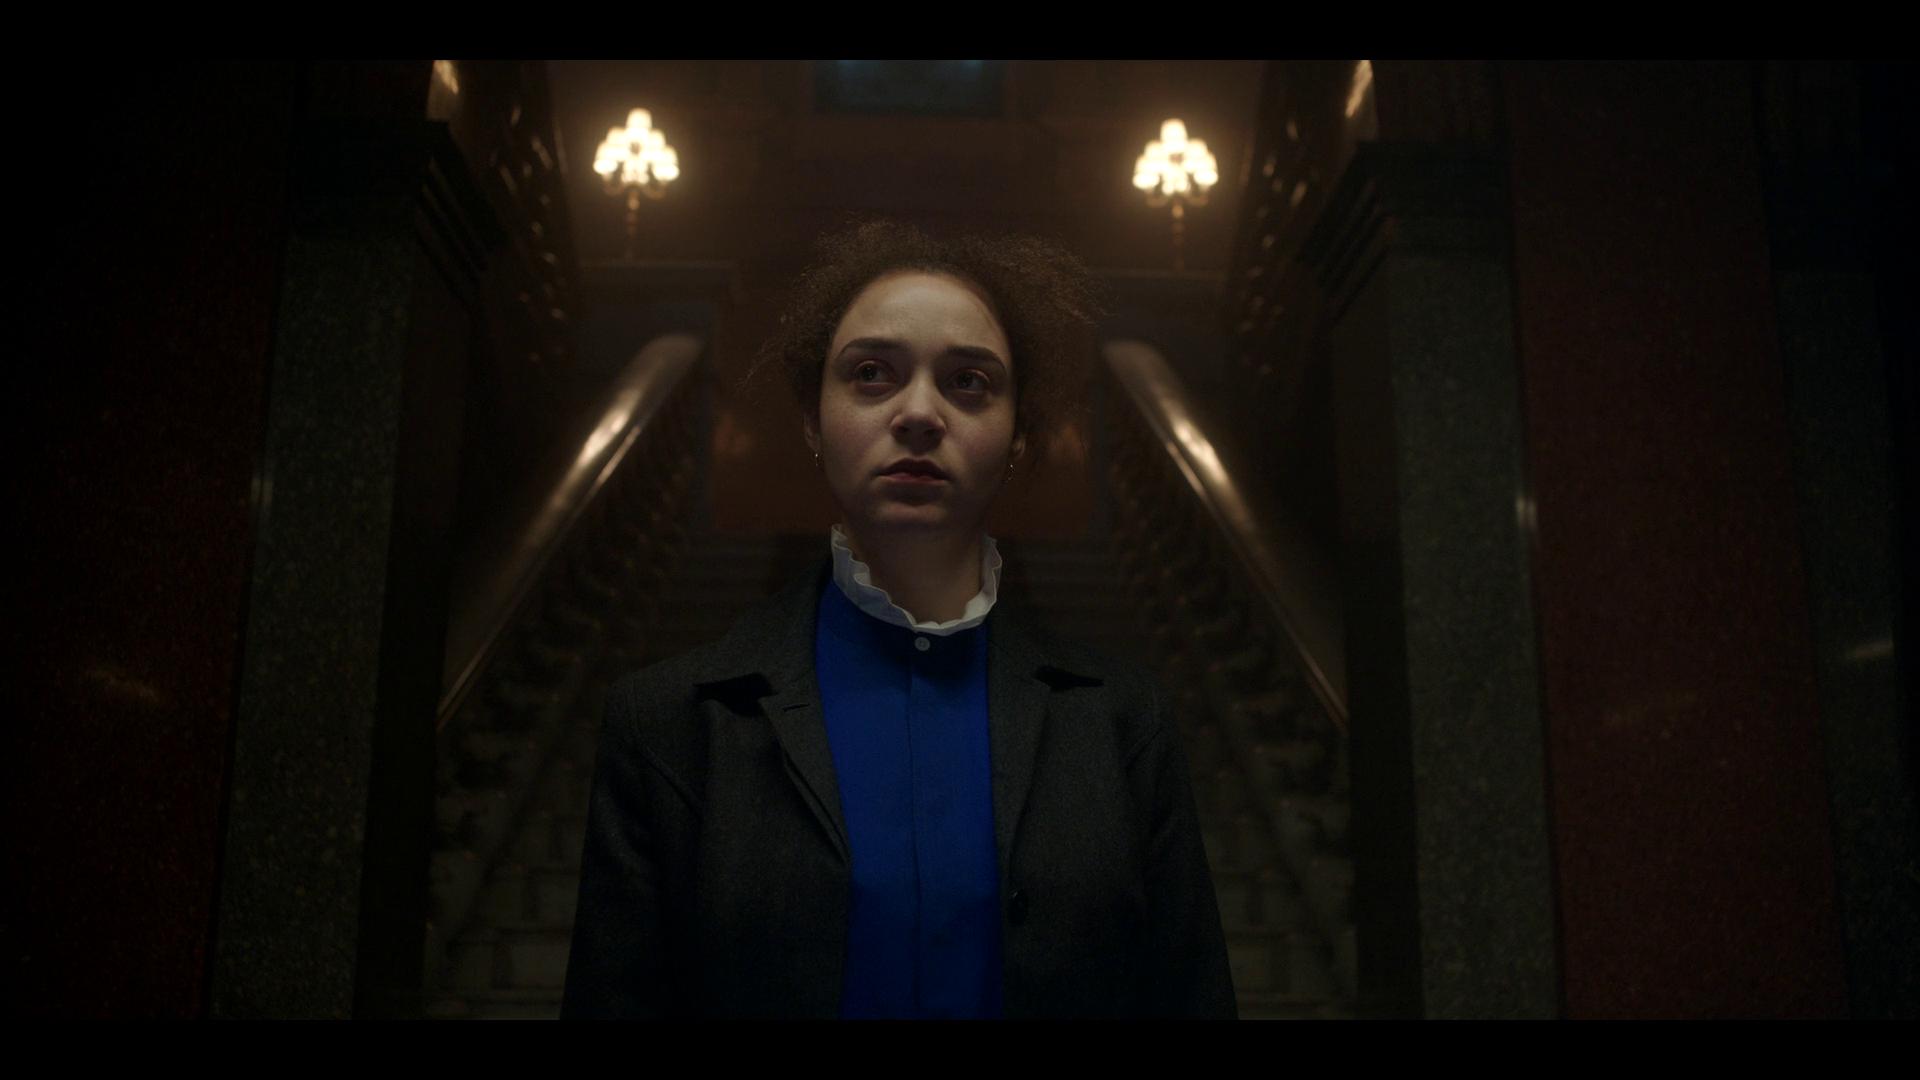 Ares (2020) Temporada 1 1080p WEB-DL Latino - Holandes - Ingles